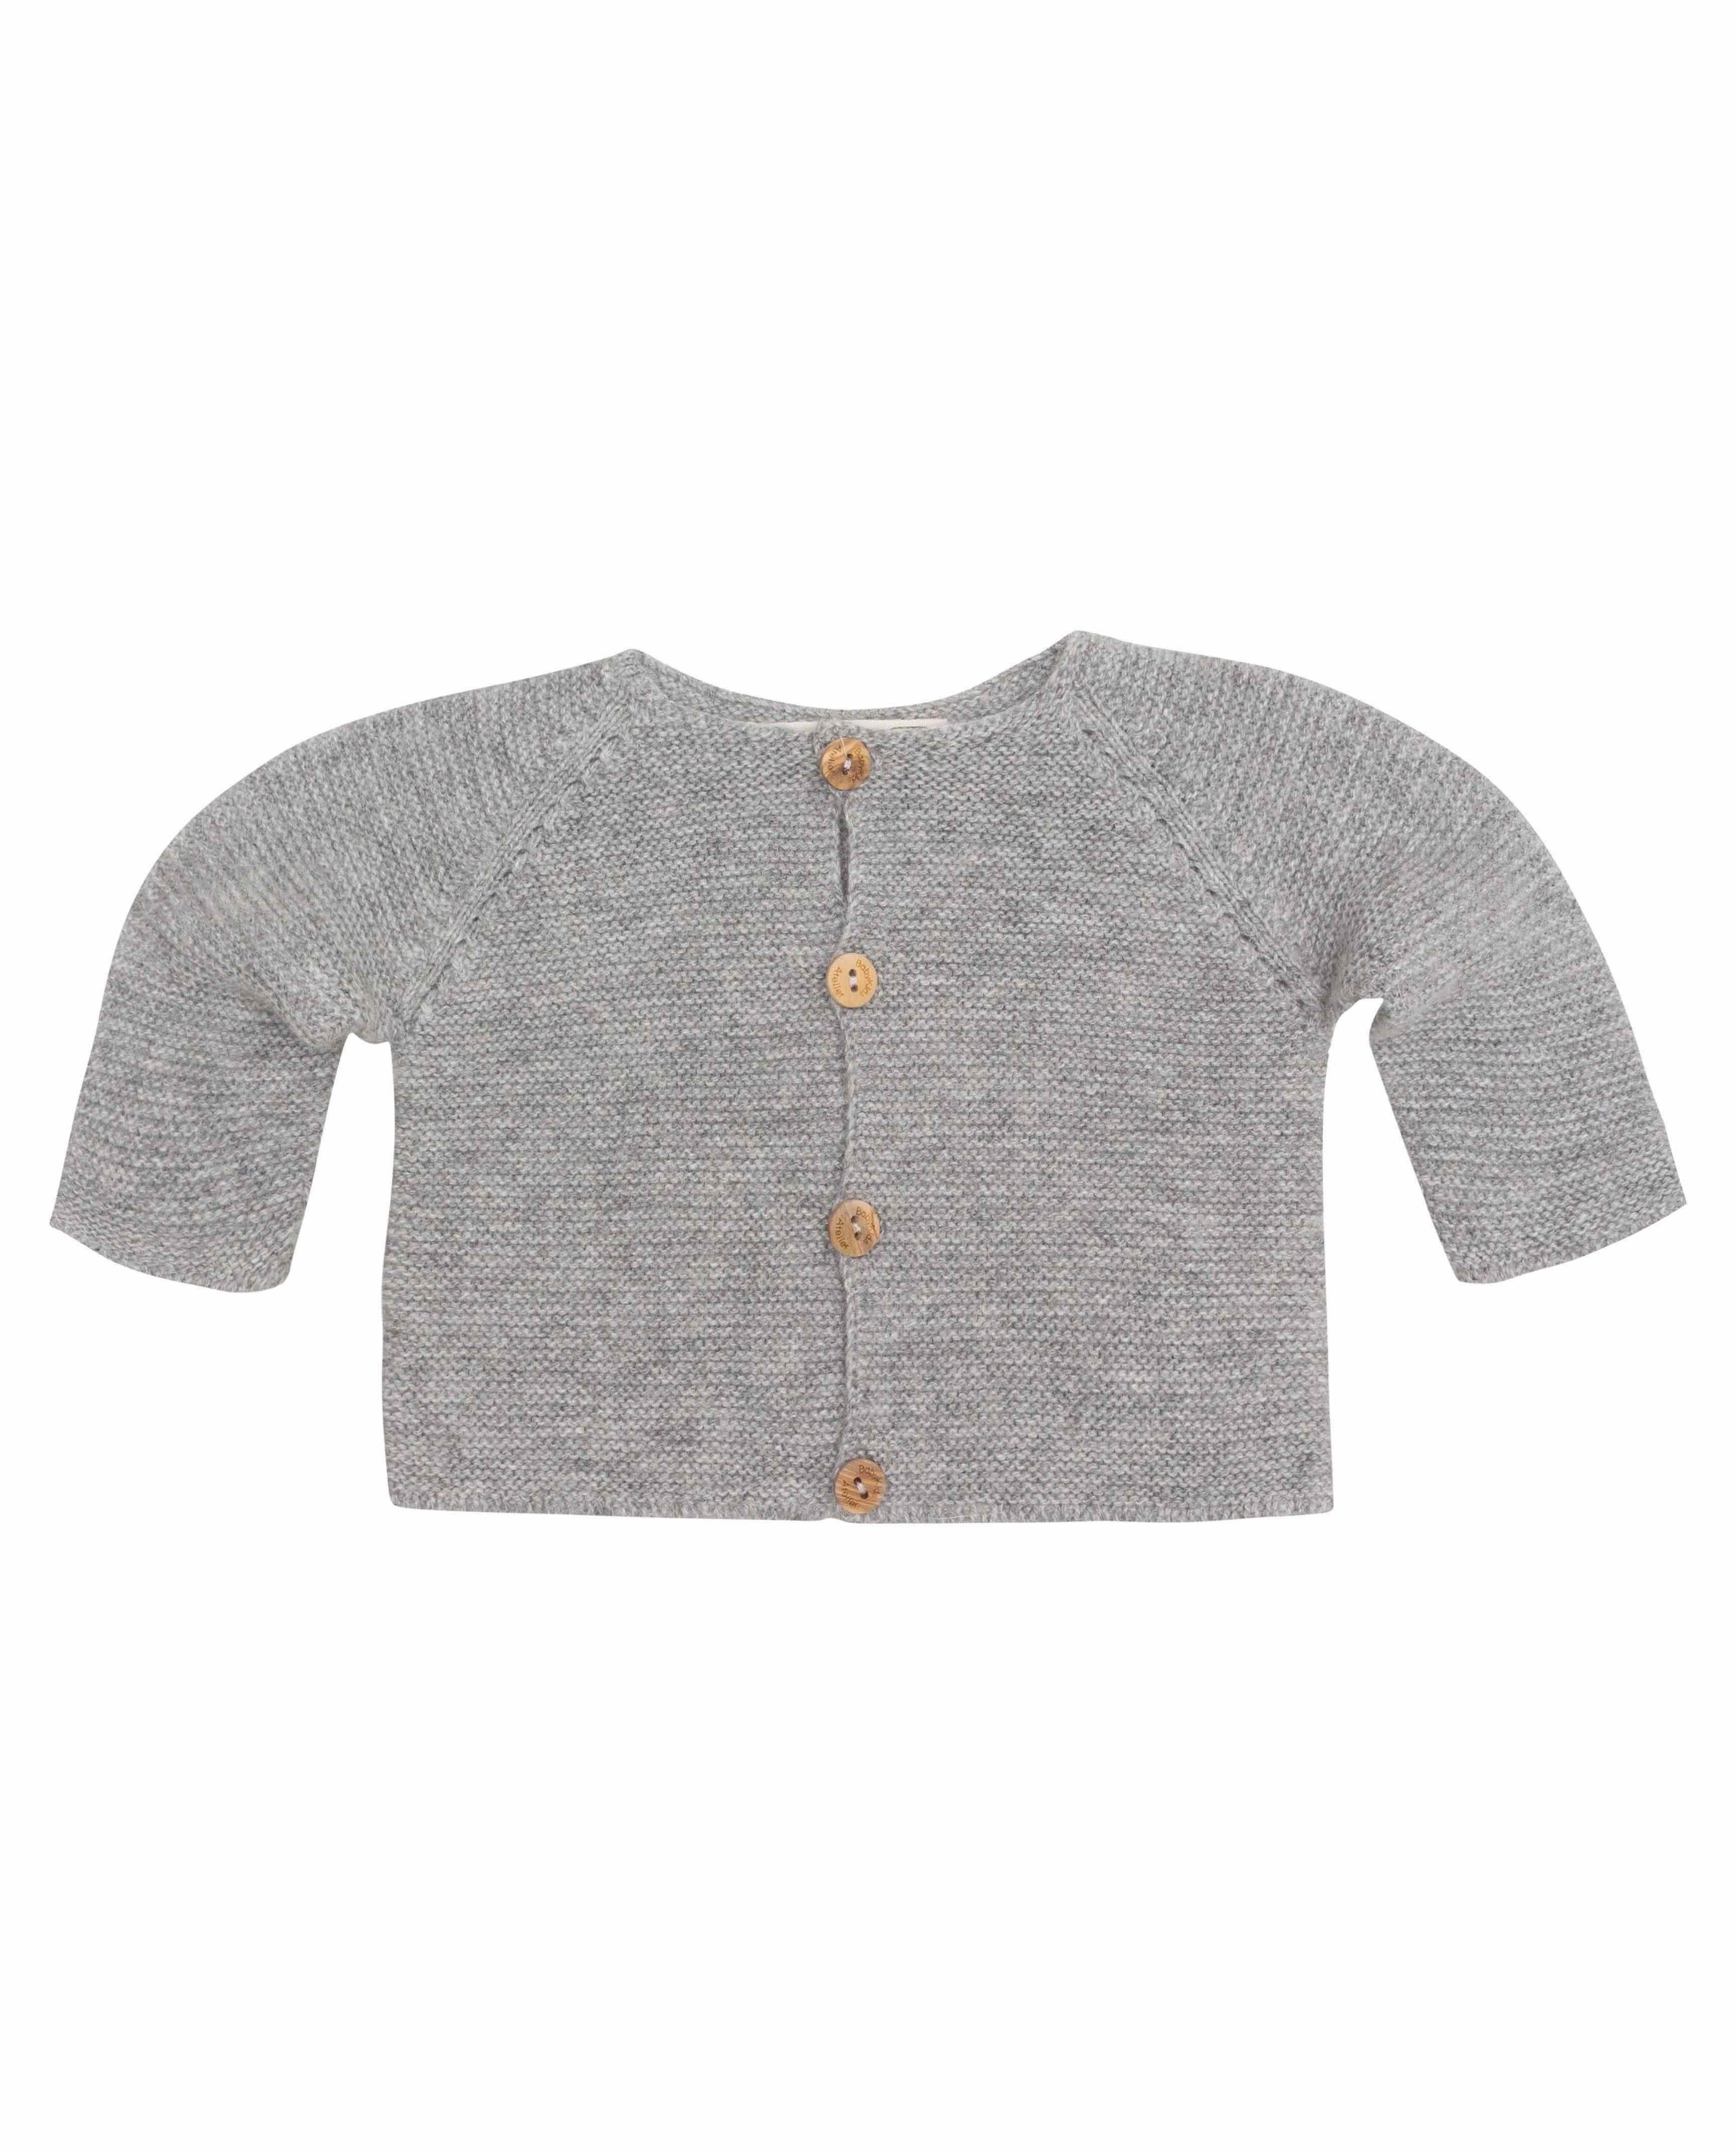 31989ee42 Chaqueta punto lana gris claro